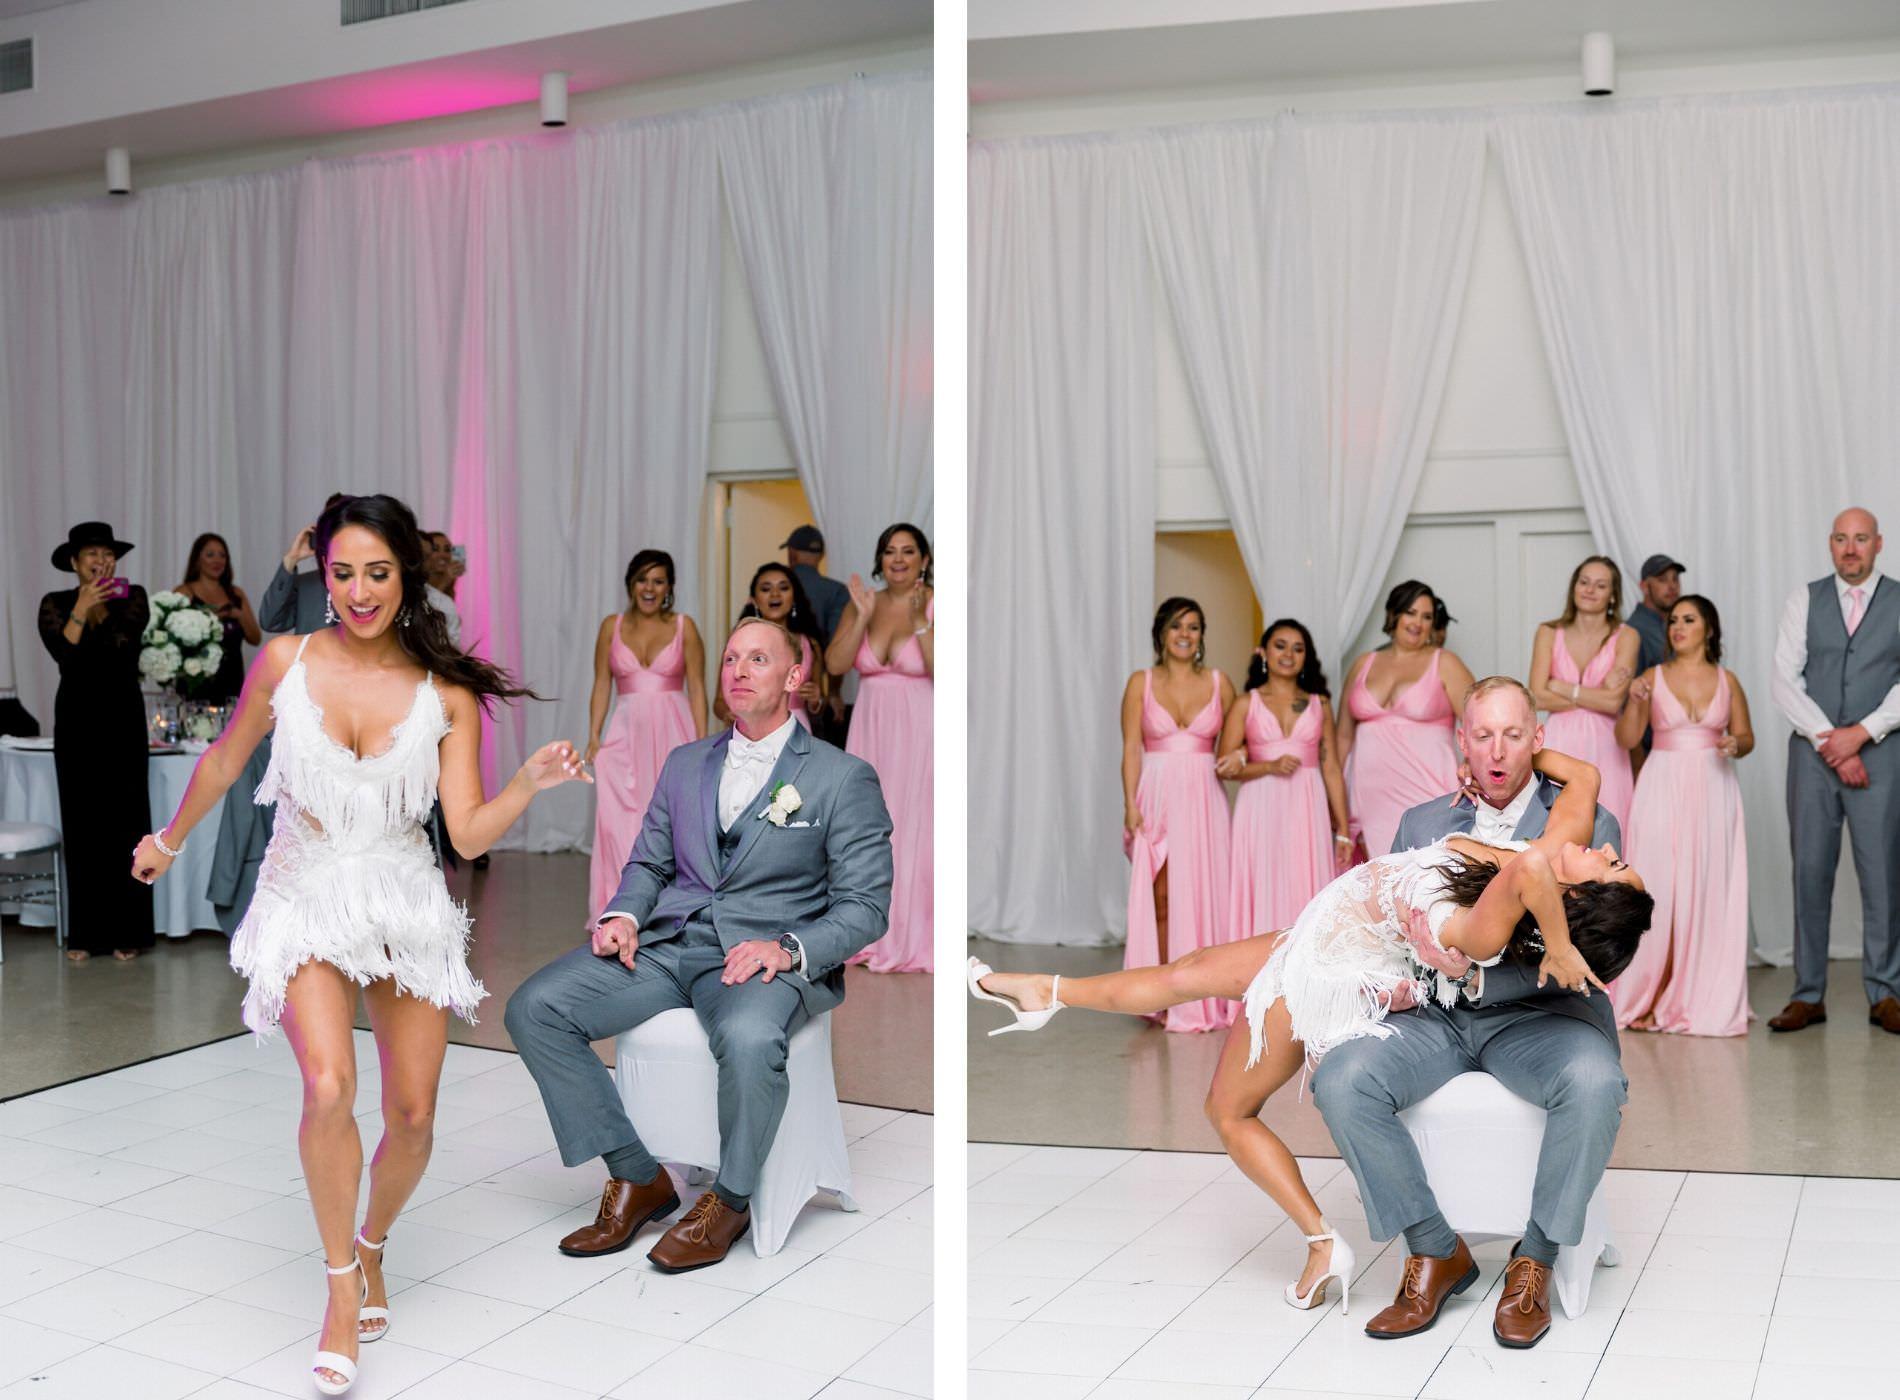 Bride in Fun Tassel White Dress and Groom Surprise Choreographed Dance Dip Ballroom Wedding Reception Portrait | Tampa Garden Club Wedding Venue | Wedding Photographer Shauna and Jordon Photography